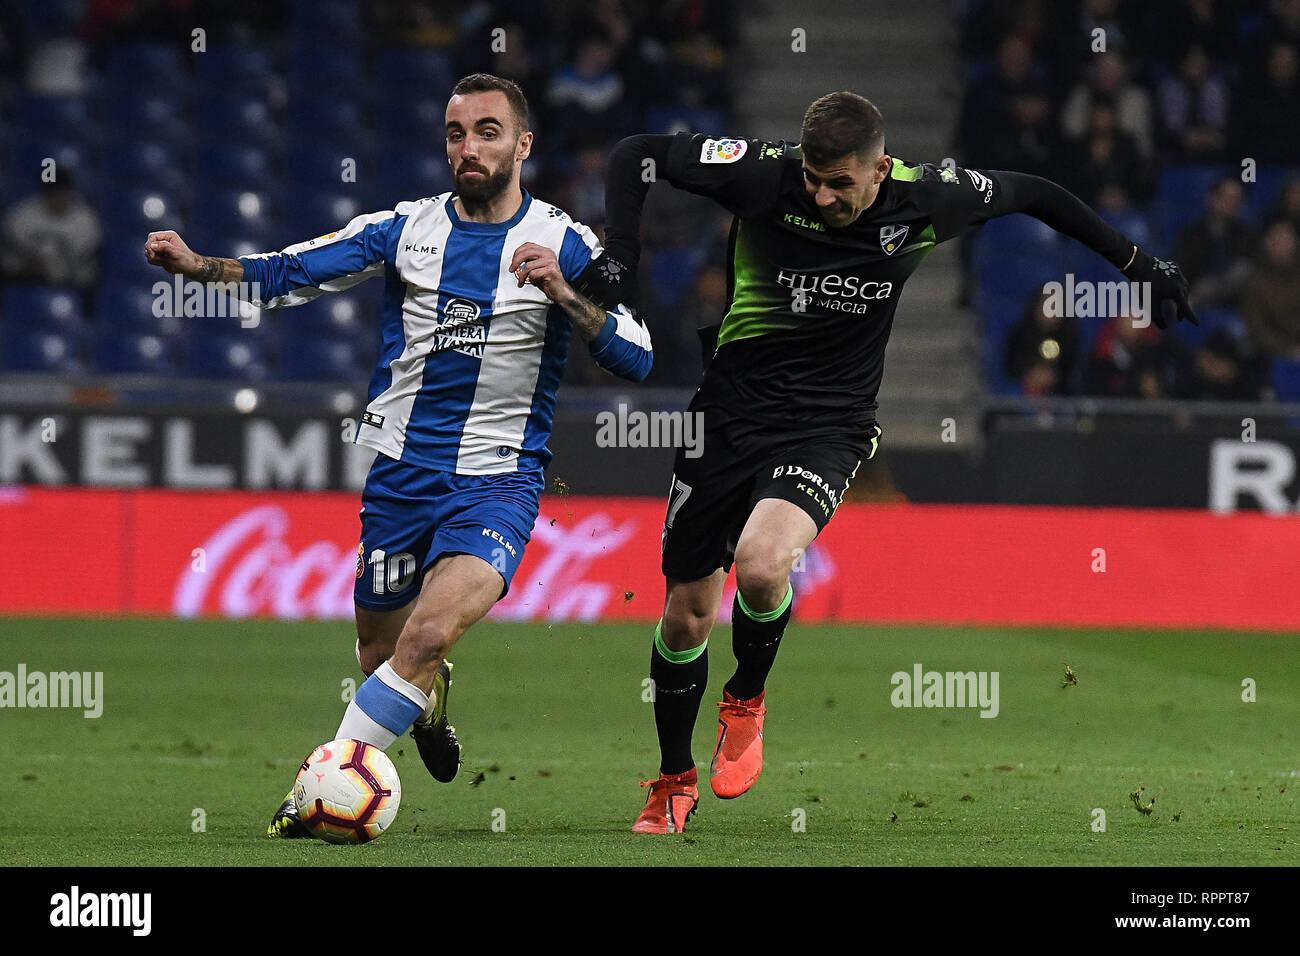 Sergi Darder of RCD Espanyol and Rivera of SD Huesca during the match between RCD Espanyol vs SD Huesca of La Liga, date 25, 2018-2019 season. RCDE Stadium. Barcelona, Spain - 22 FEB 2019. - Stock Image